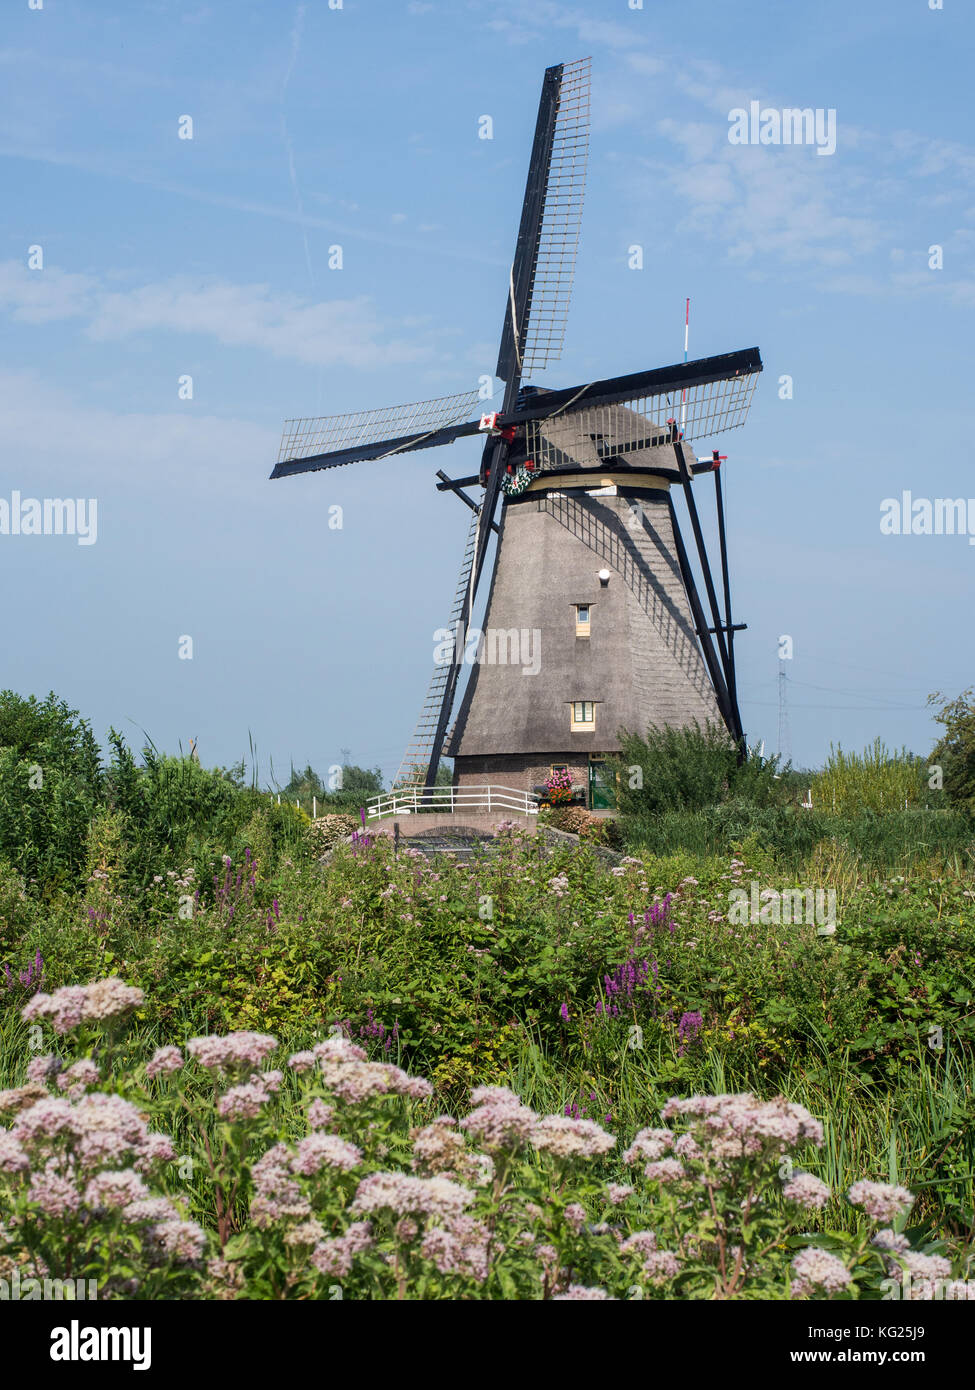 Windmill, Kinderdijk, UNESCO World Heritage Site, Netherlands, Europe - Stock Image